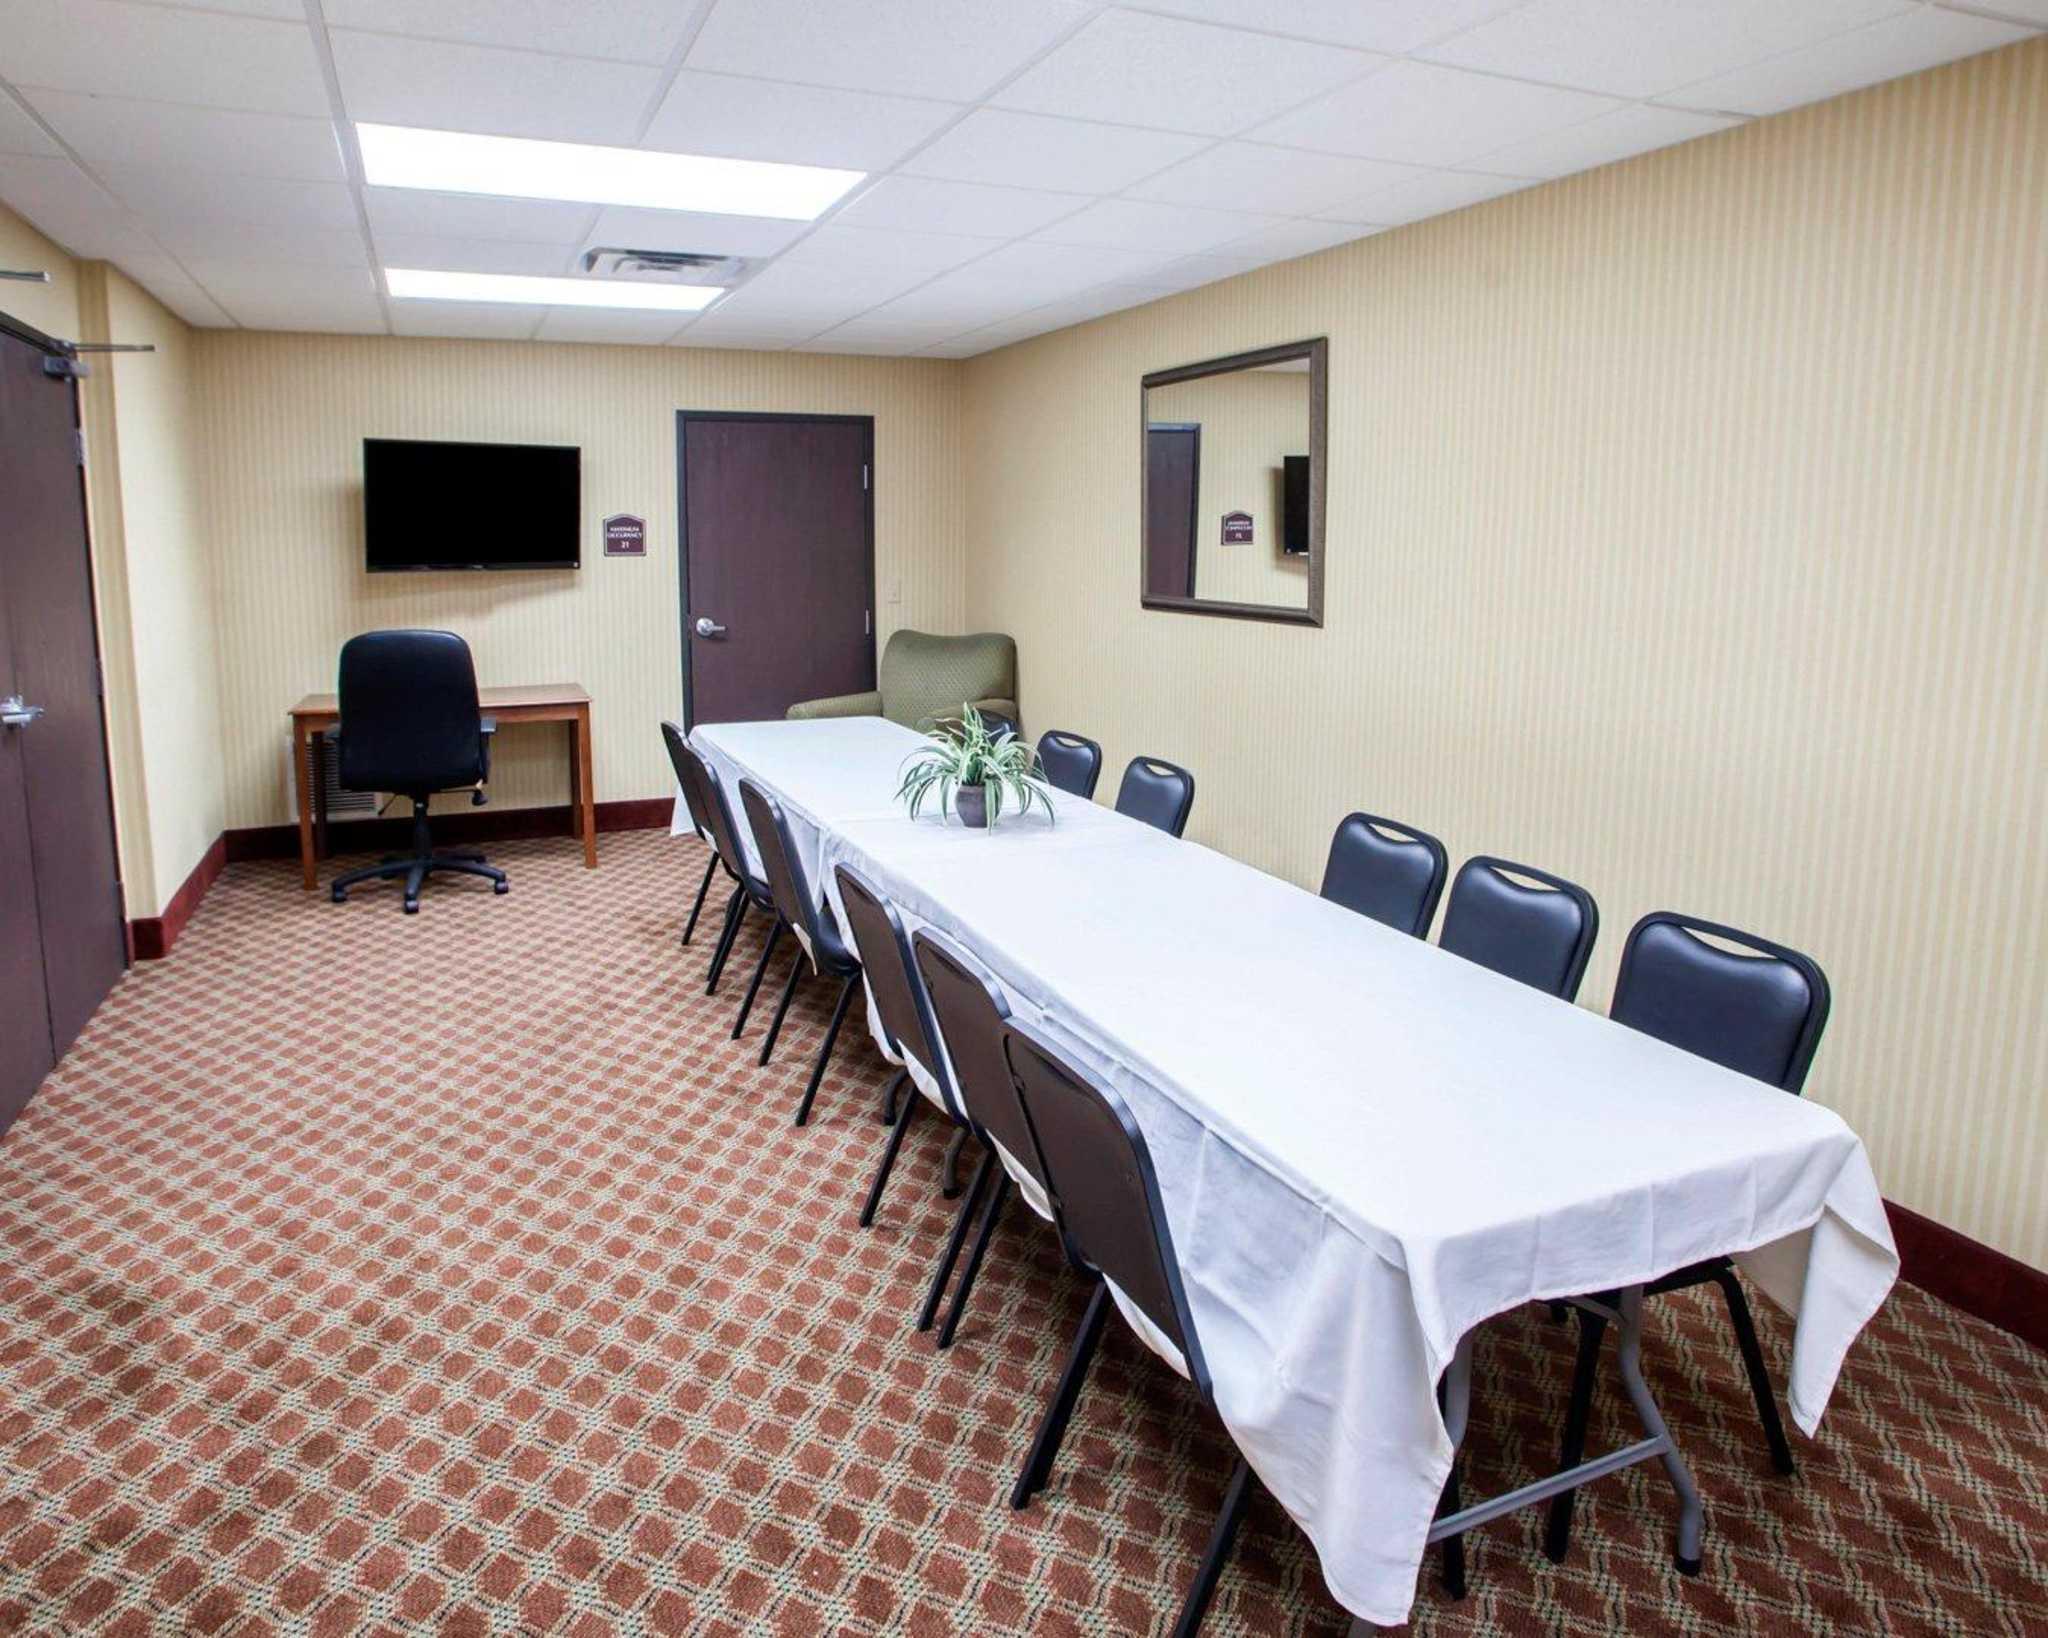 Comfort Inn & Suites image 30